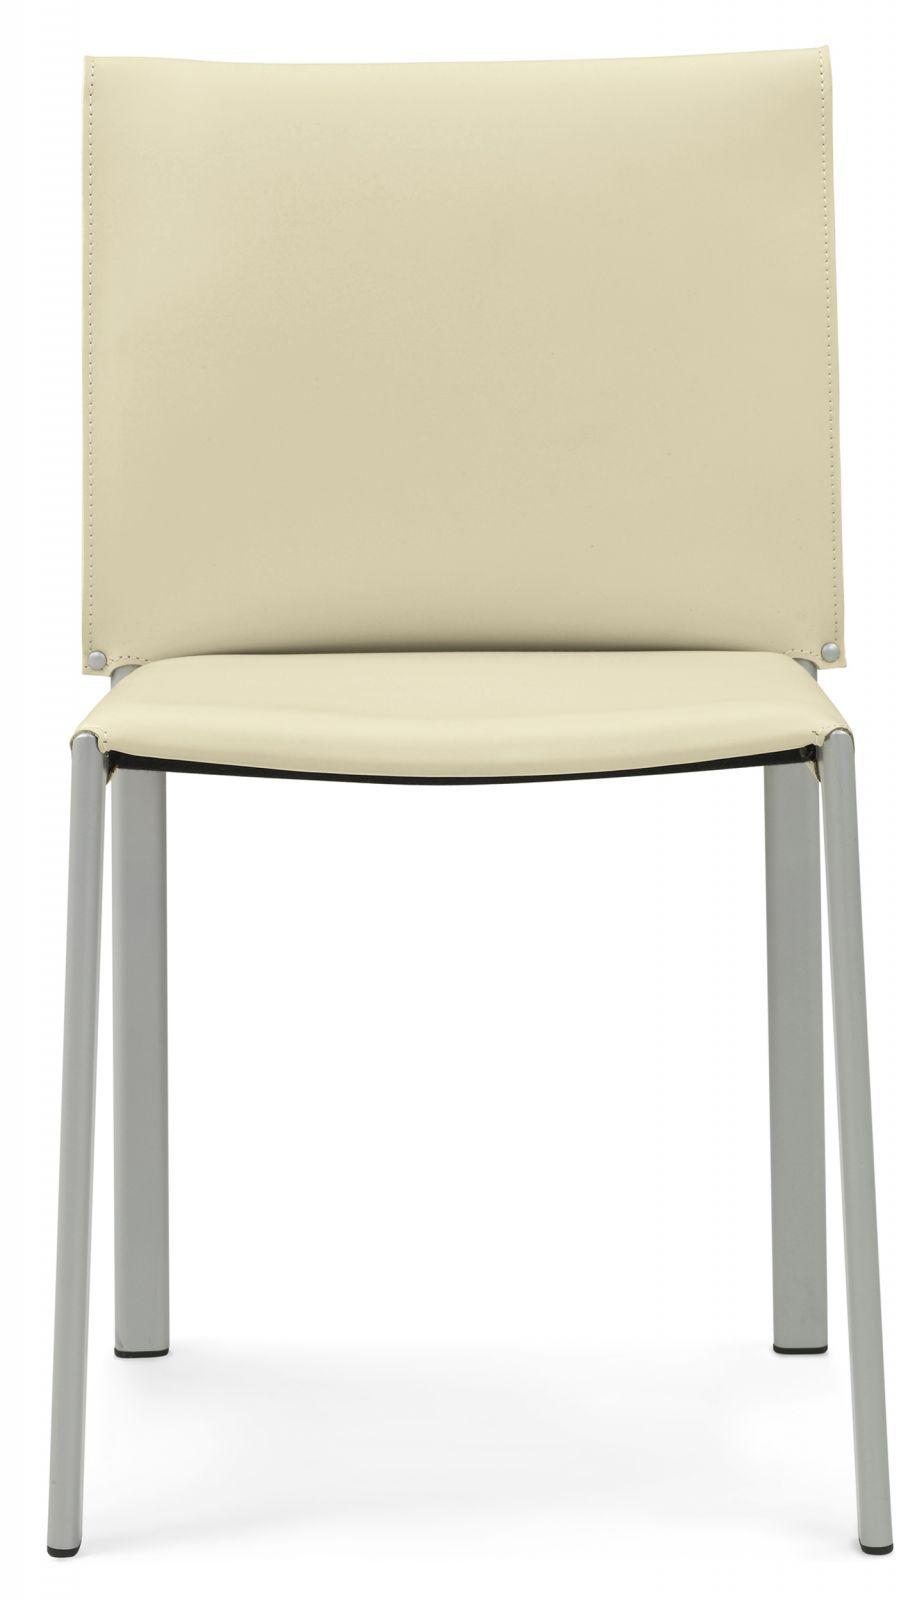 modern-office-furniture-chairs-Italian-designer-furniture (11).jpg